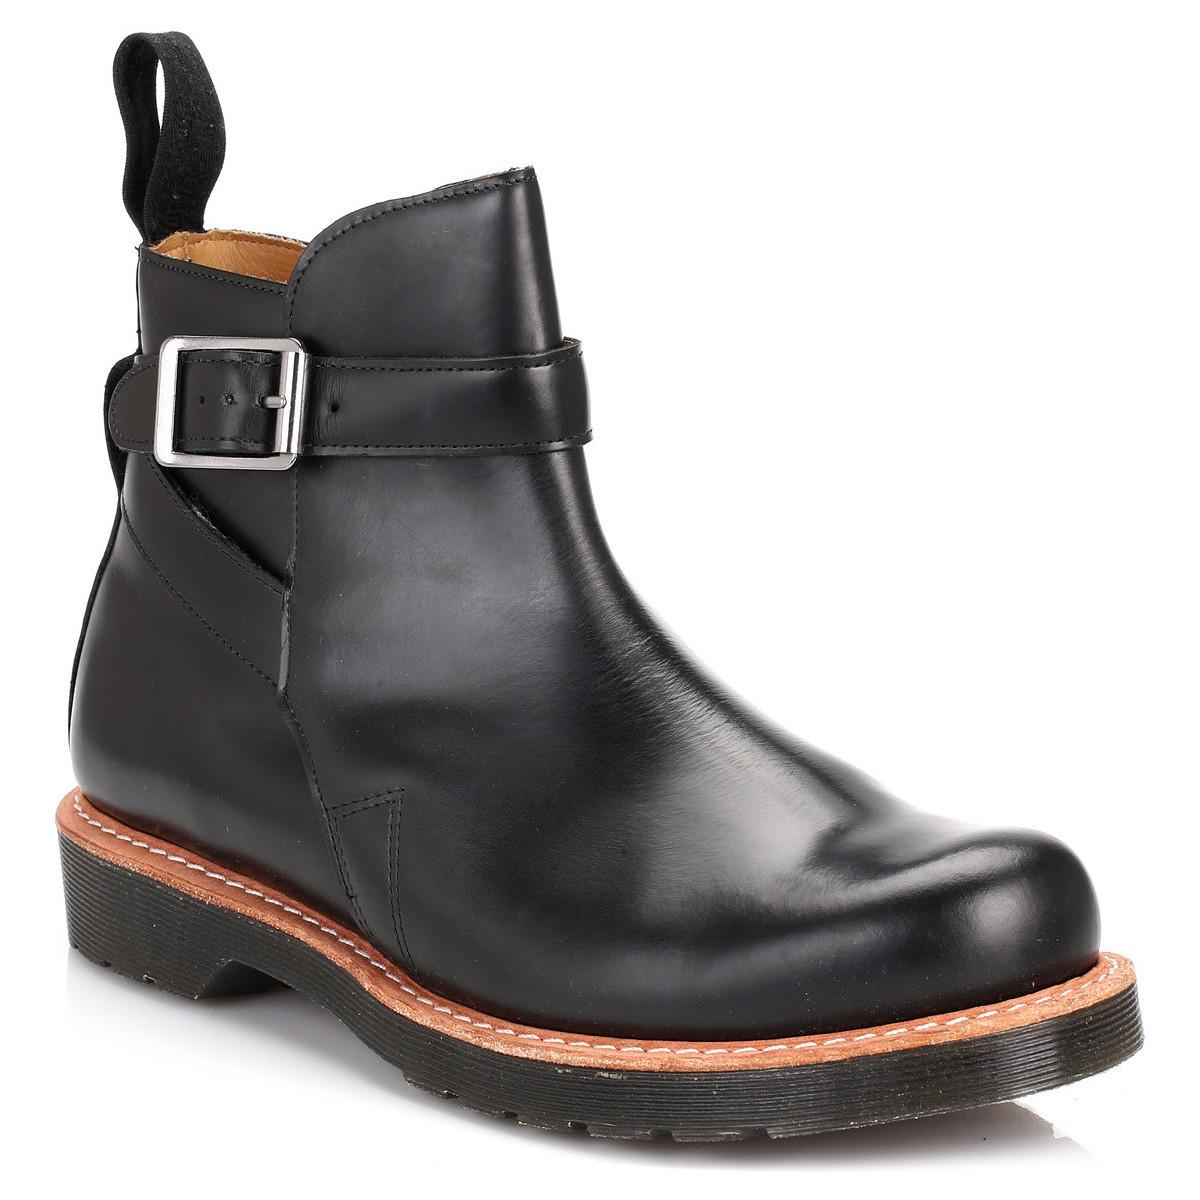 Airwalk Boots | Doc Marten Boots Mens | Knock Off Dr Martens